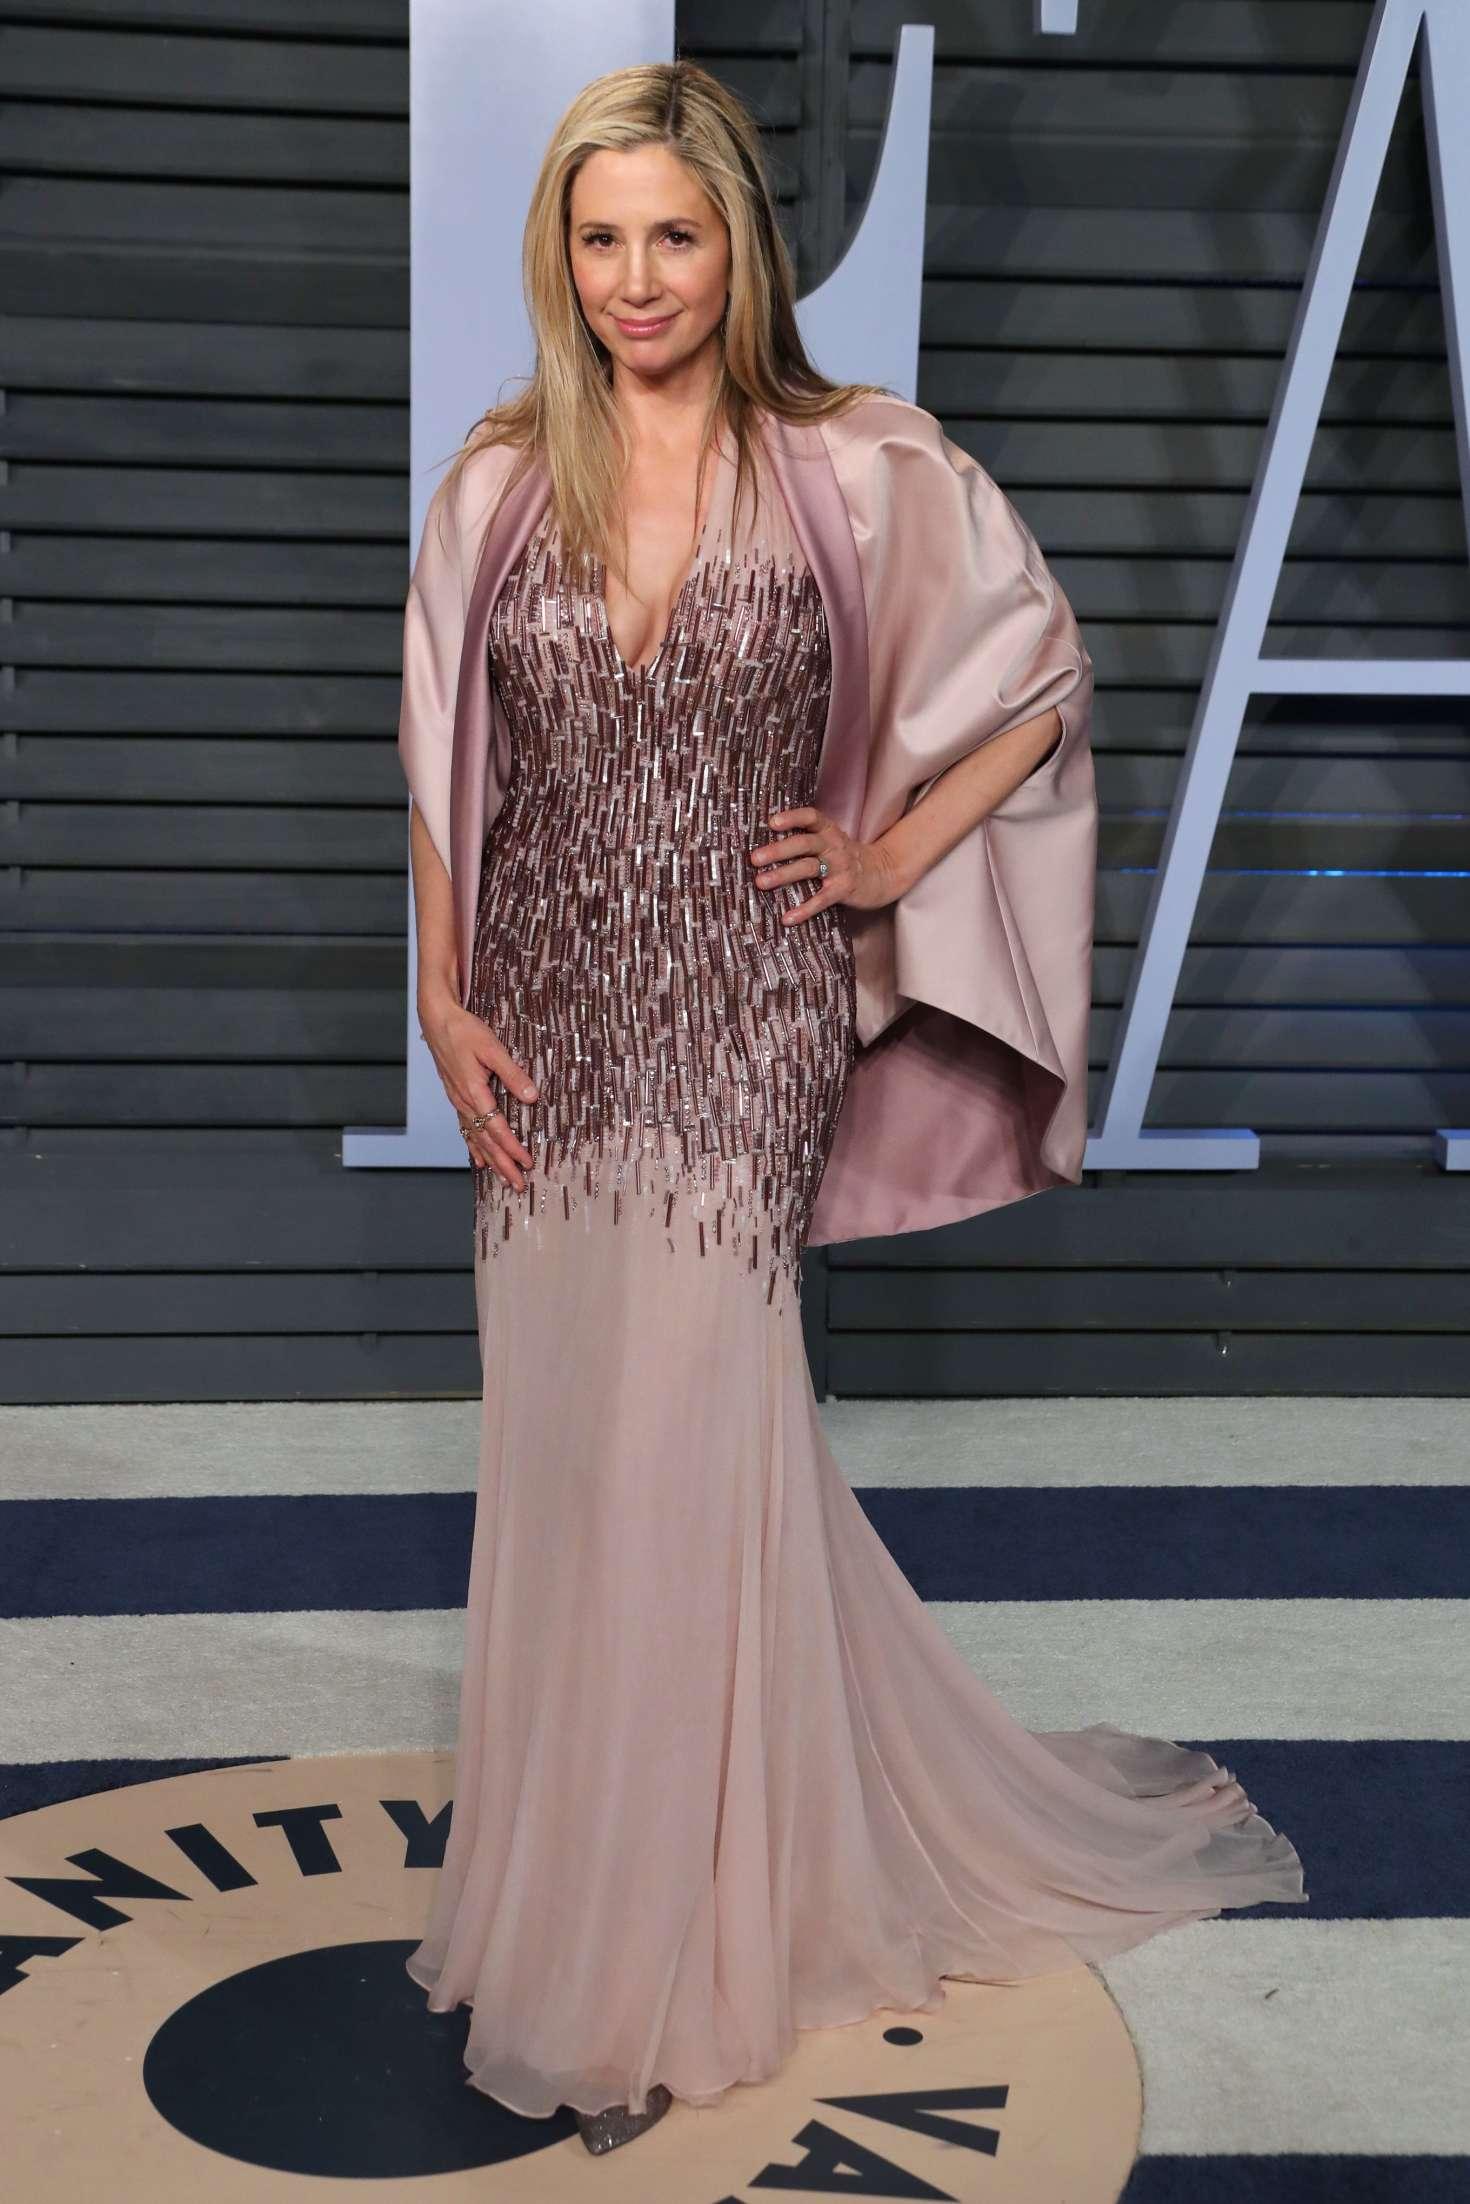 Mira Sorvino 2018 : Mira Sorvino: 2018 Vanity Fair Oscar Party -01